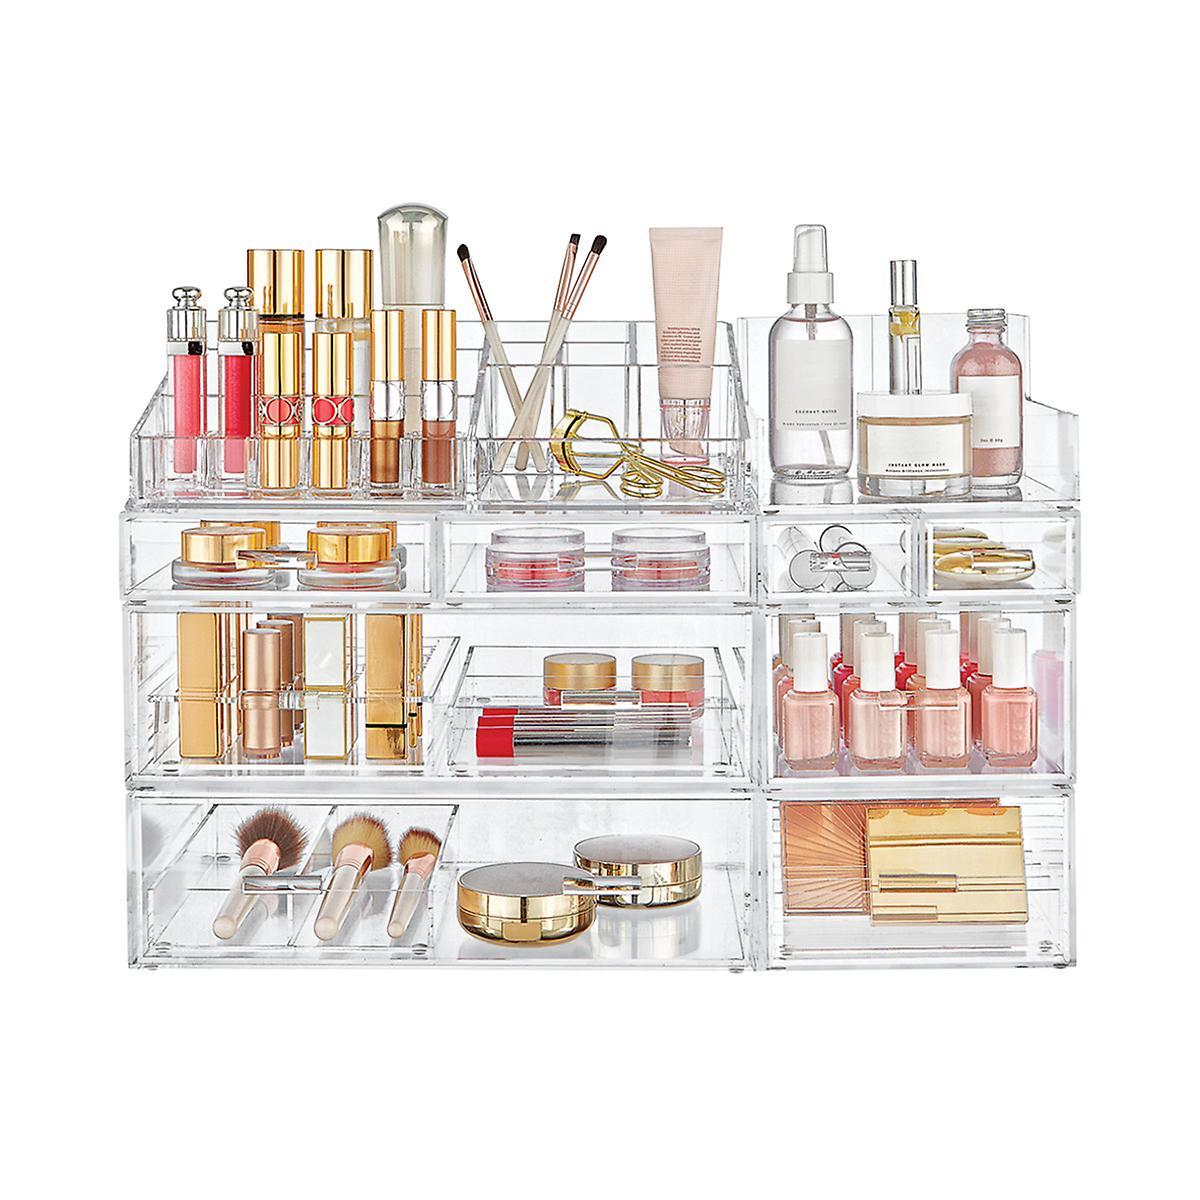 Luxe Acrylic Large Makeup & Nail Polish Storage Starter Kit